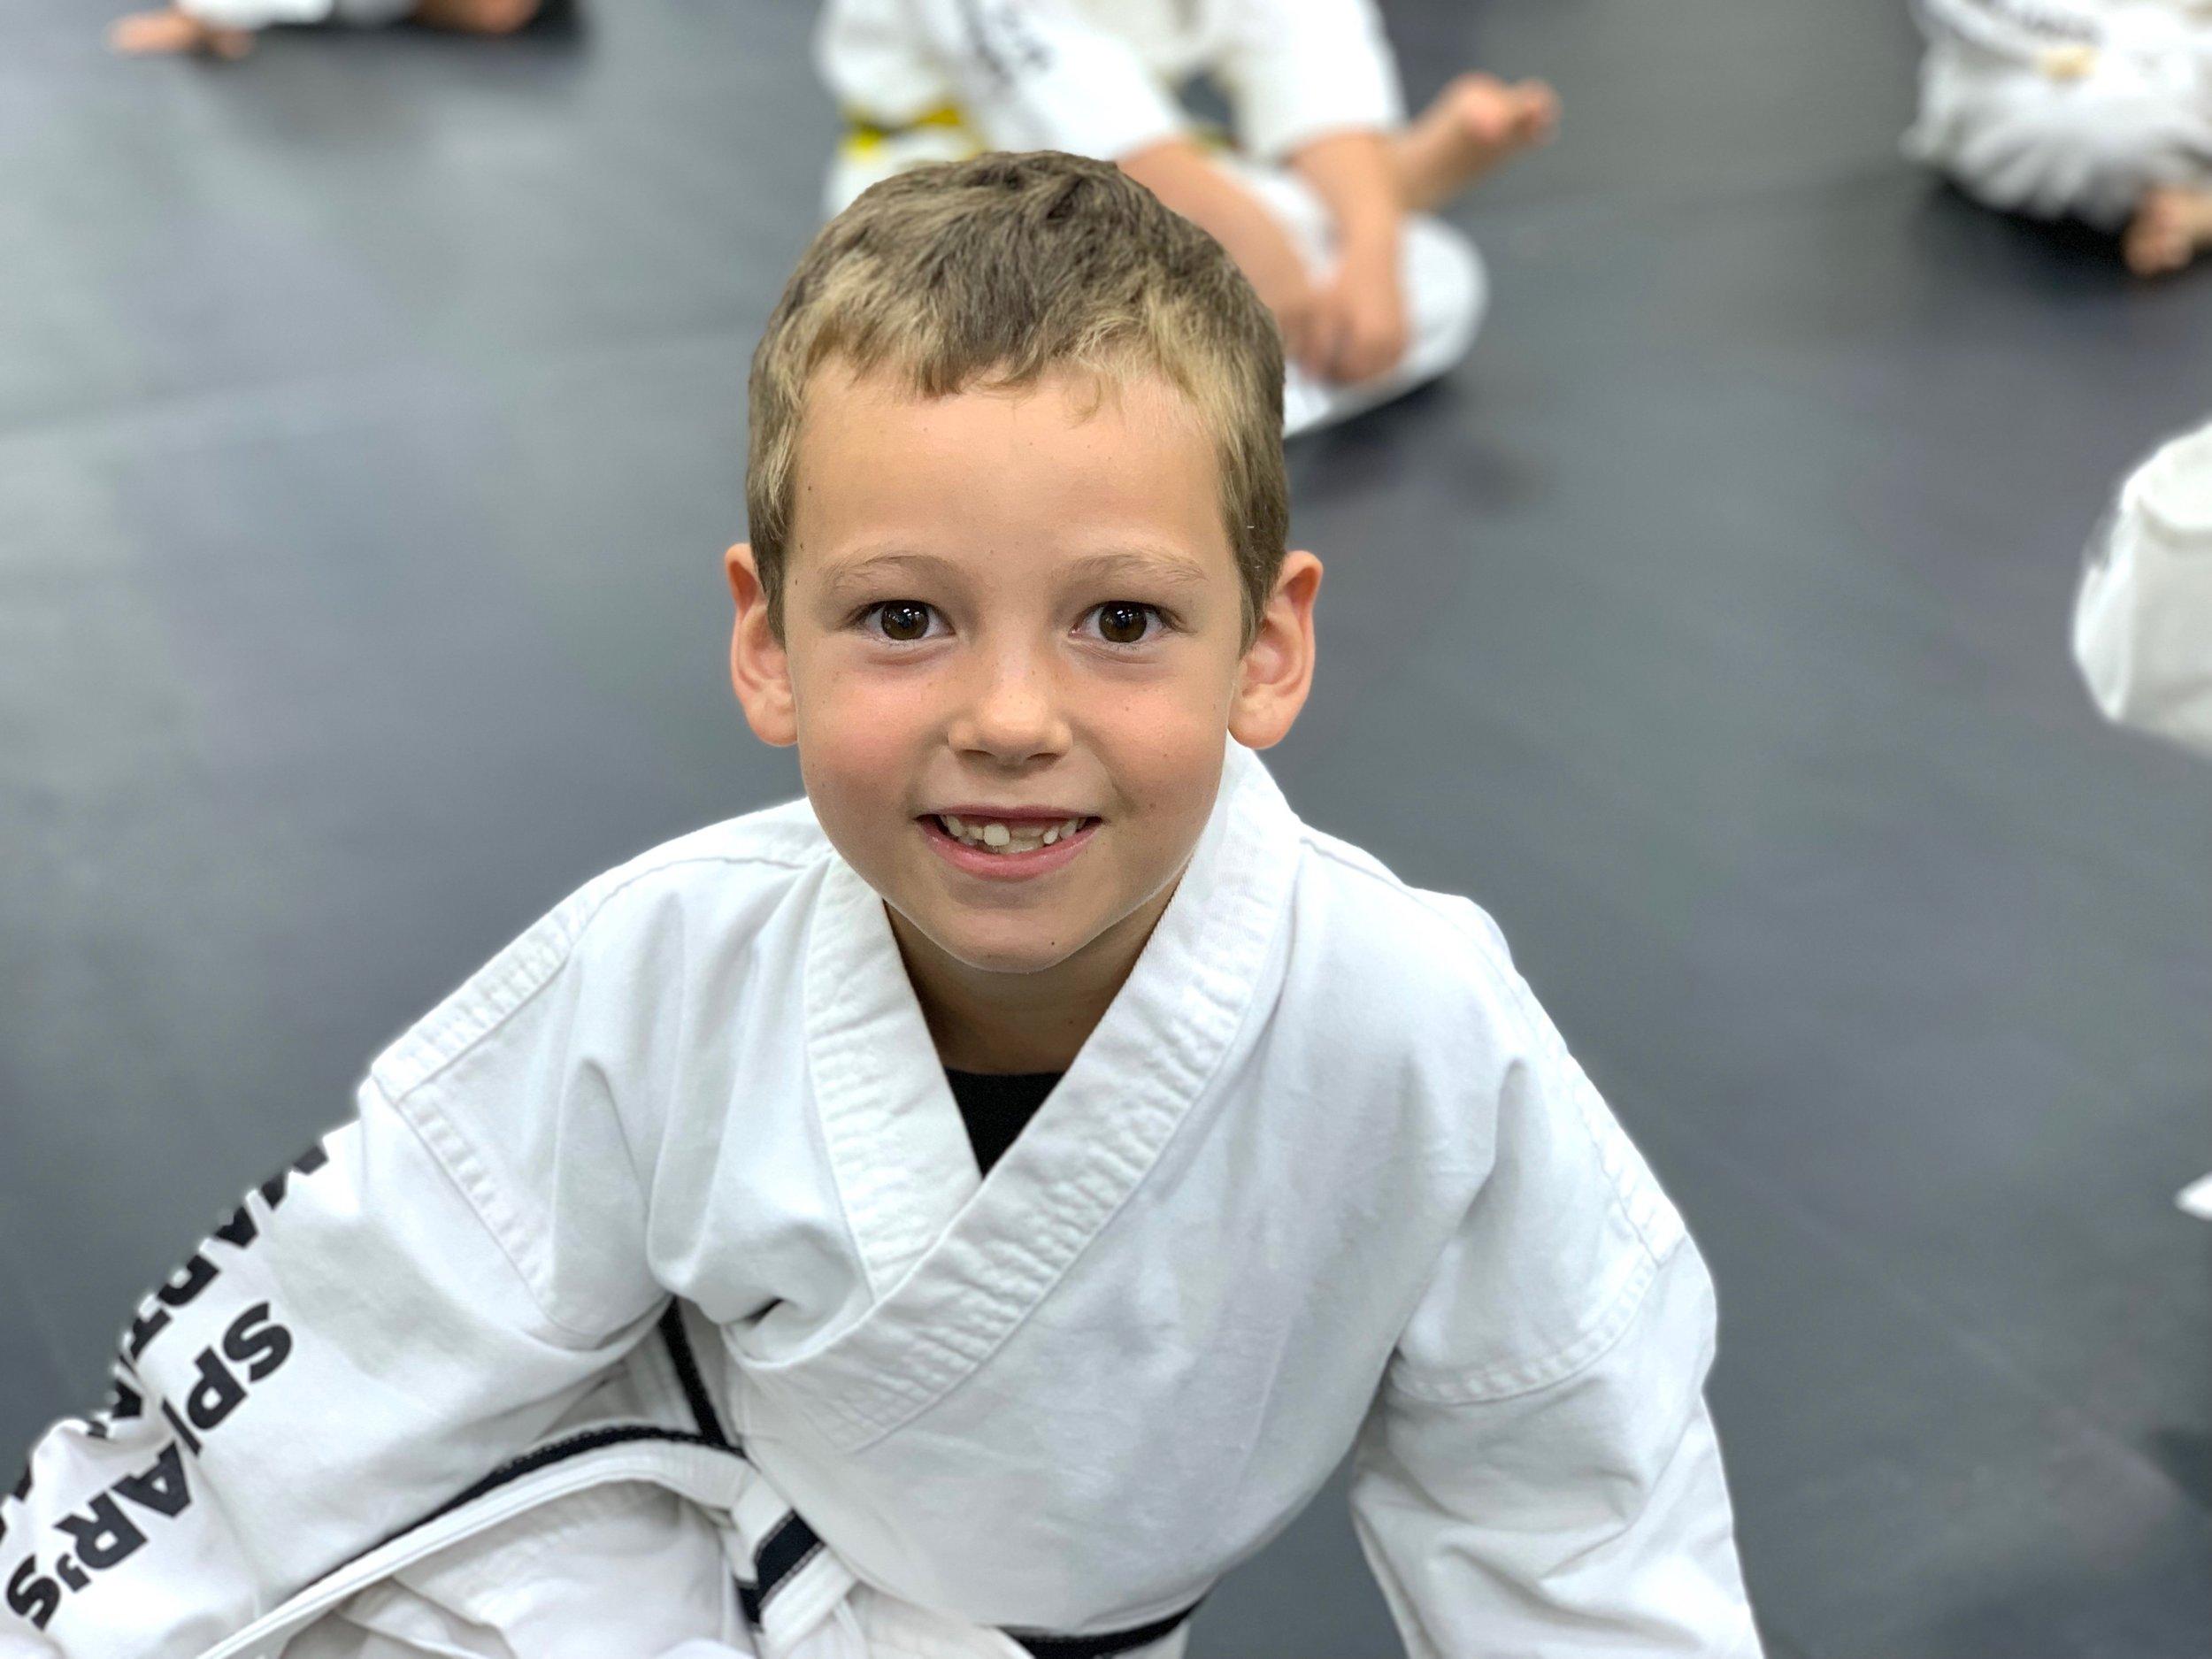 karate-kids-program-souhtlake-keller-grapevine-texas00056.jpeg